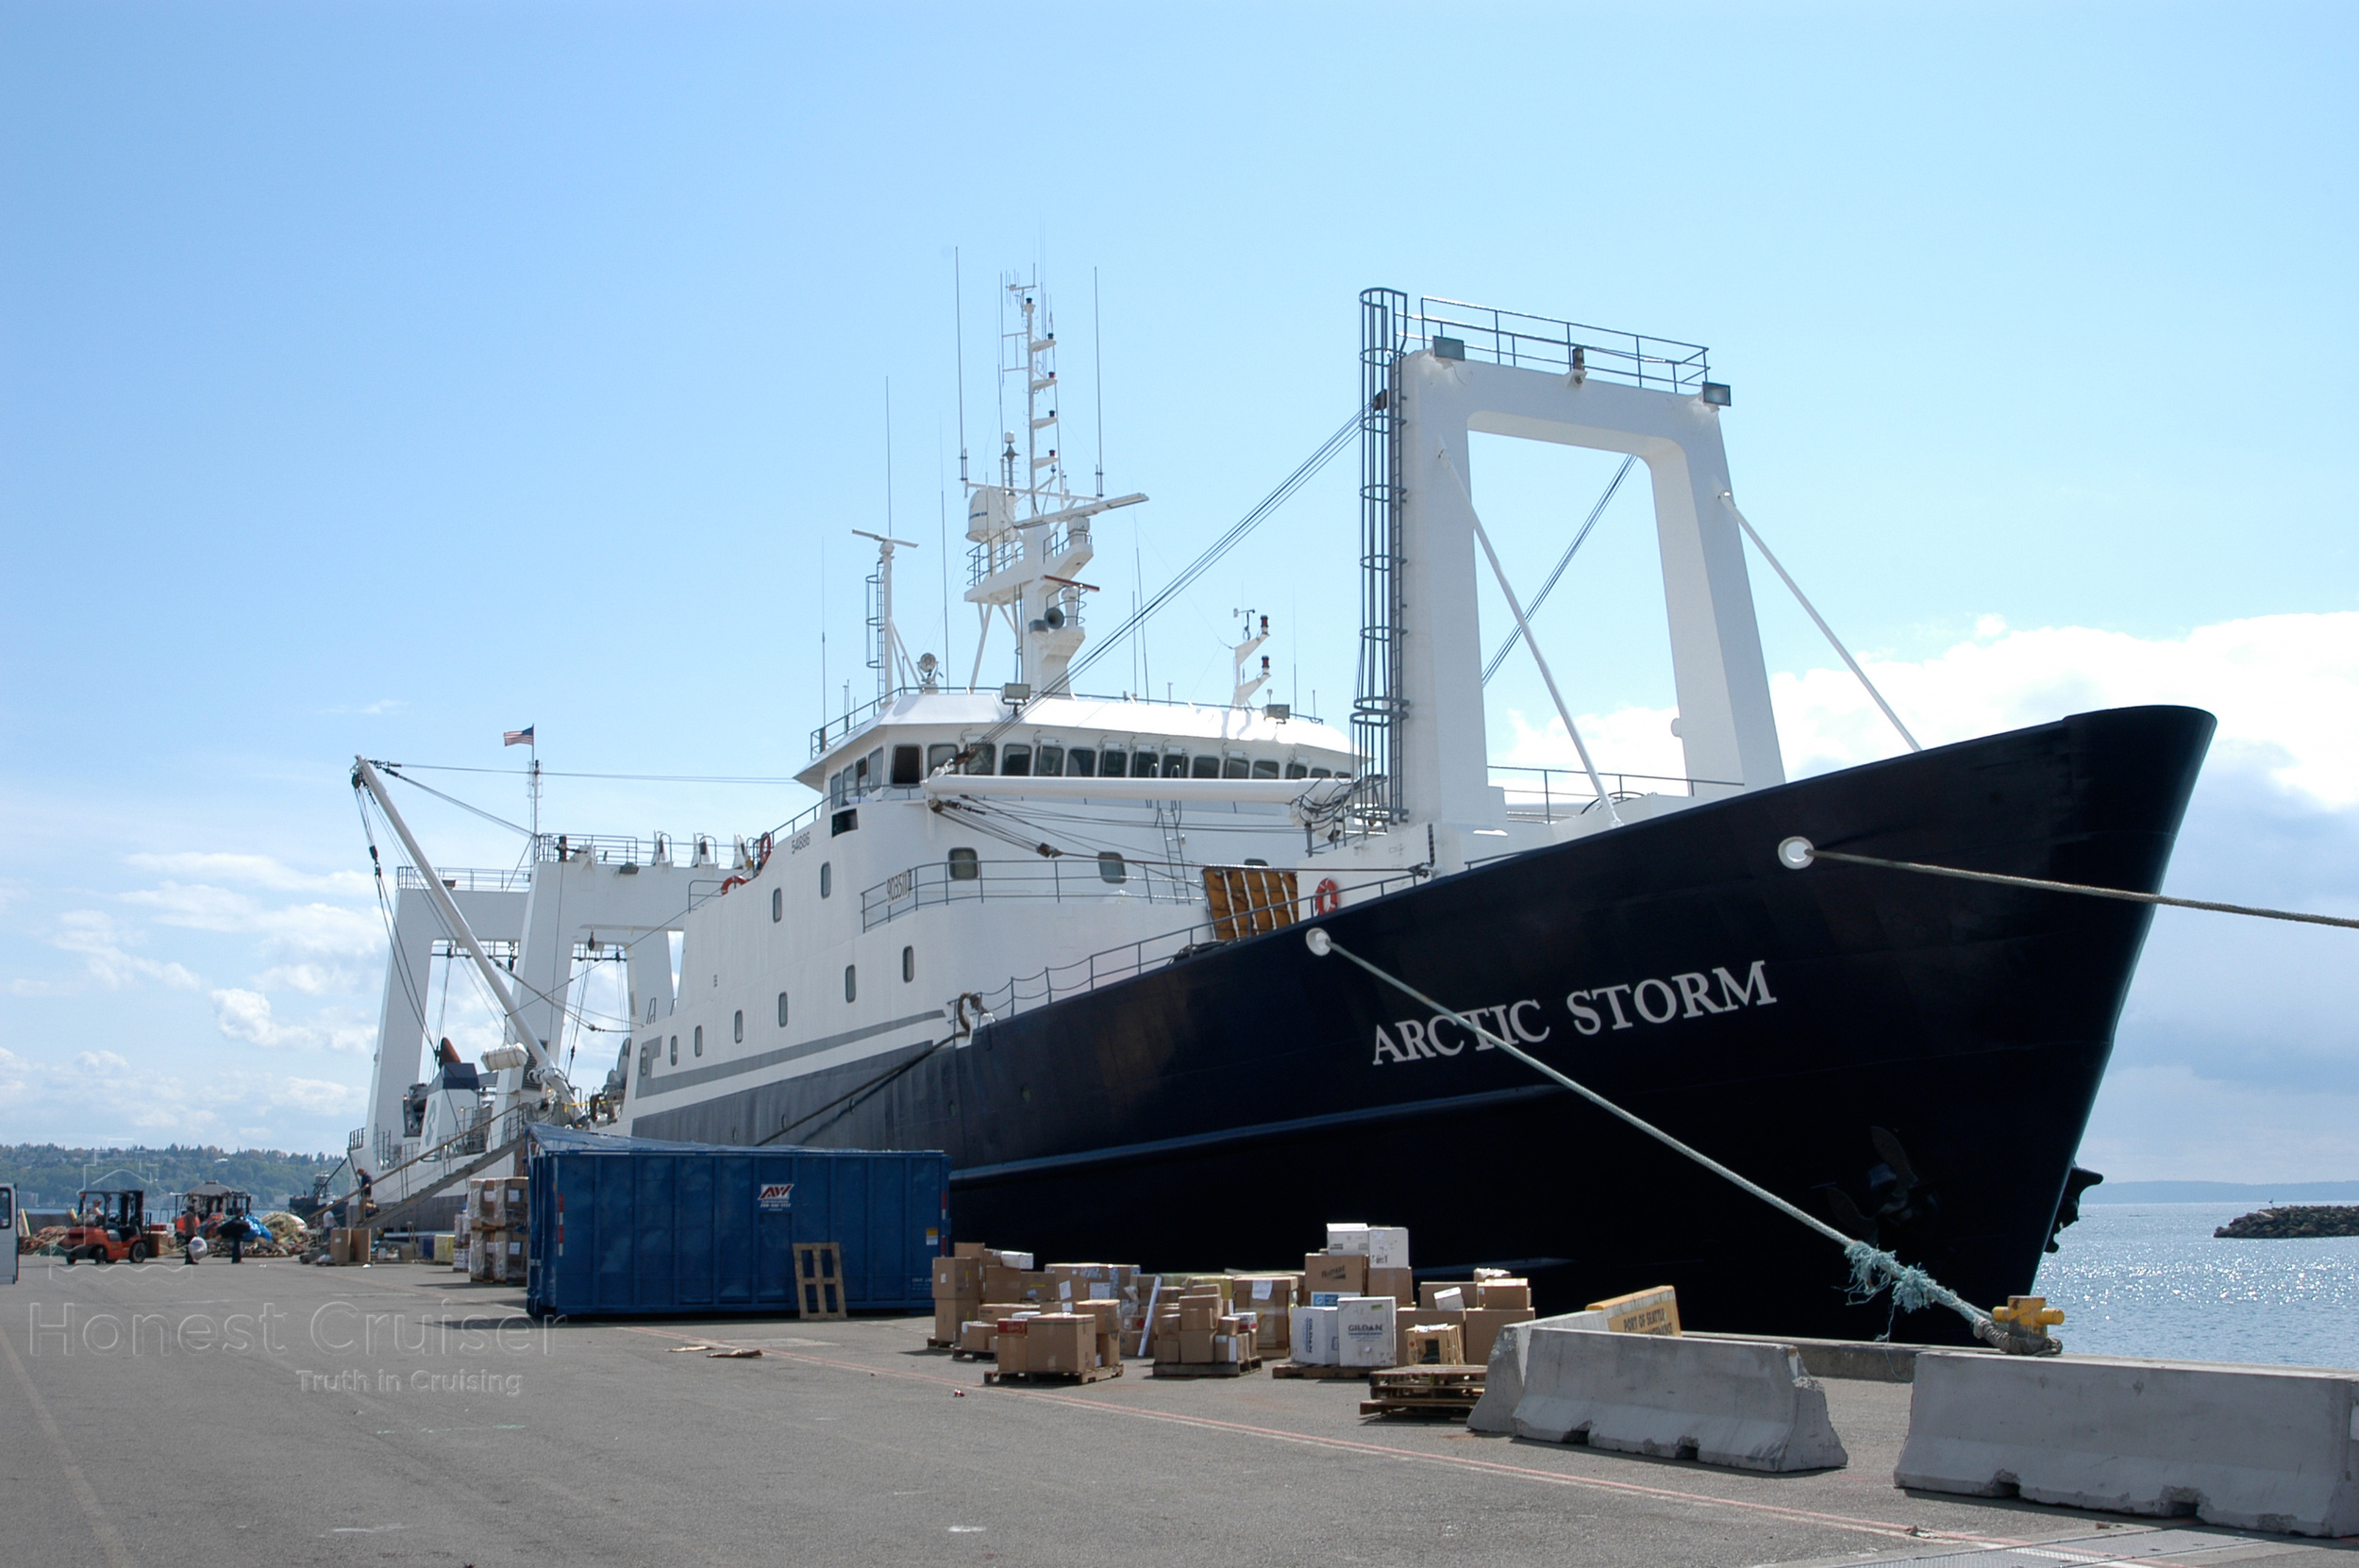 Arctic Storm loading supplies. Photograph courtesy of Captain Hempstead.